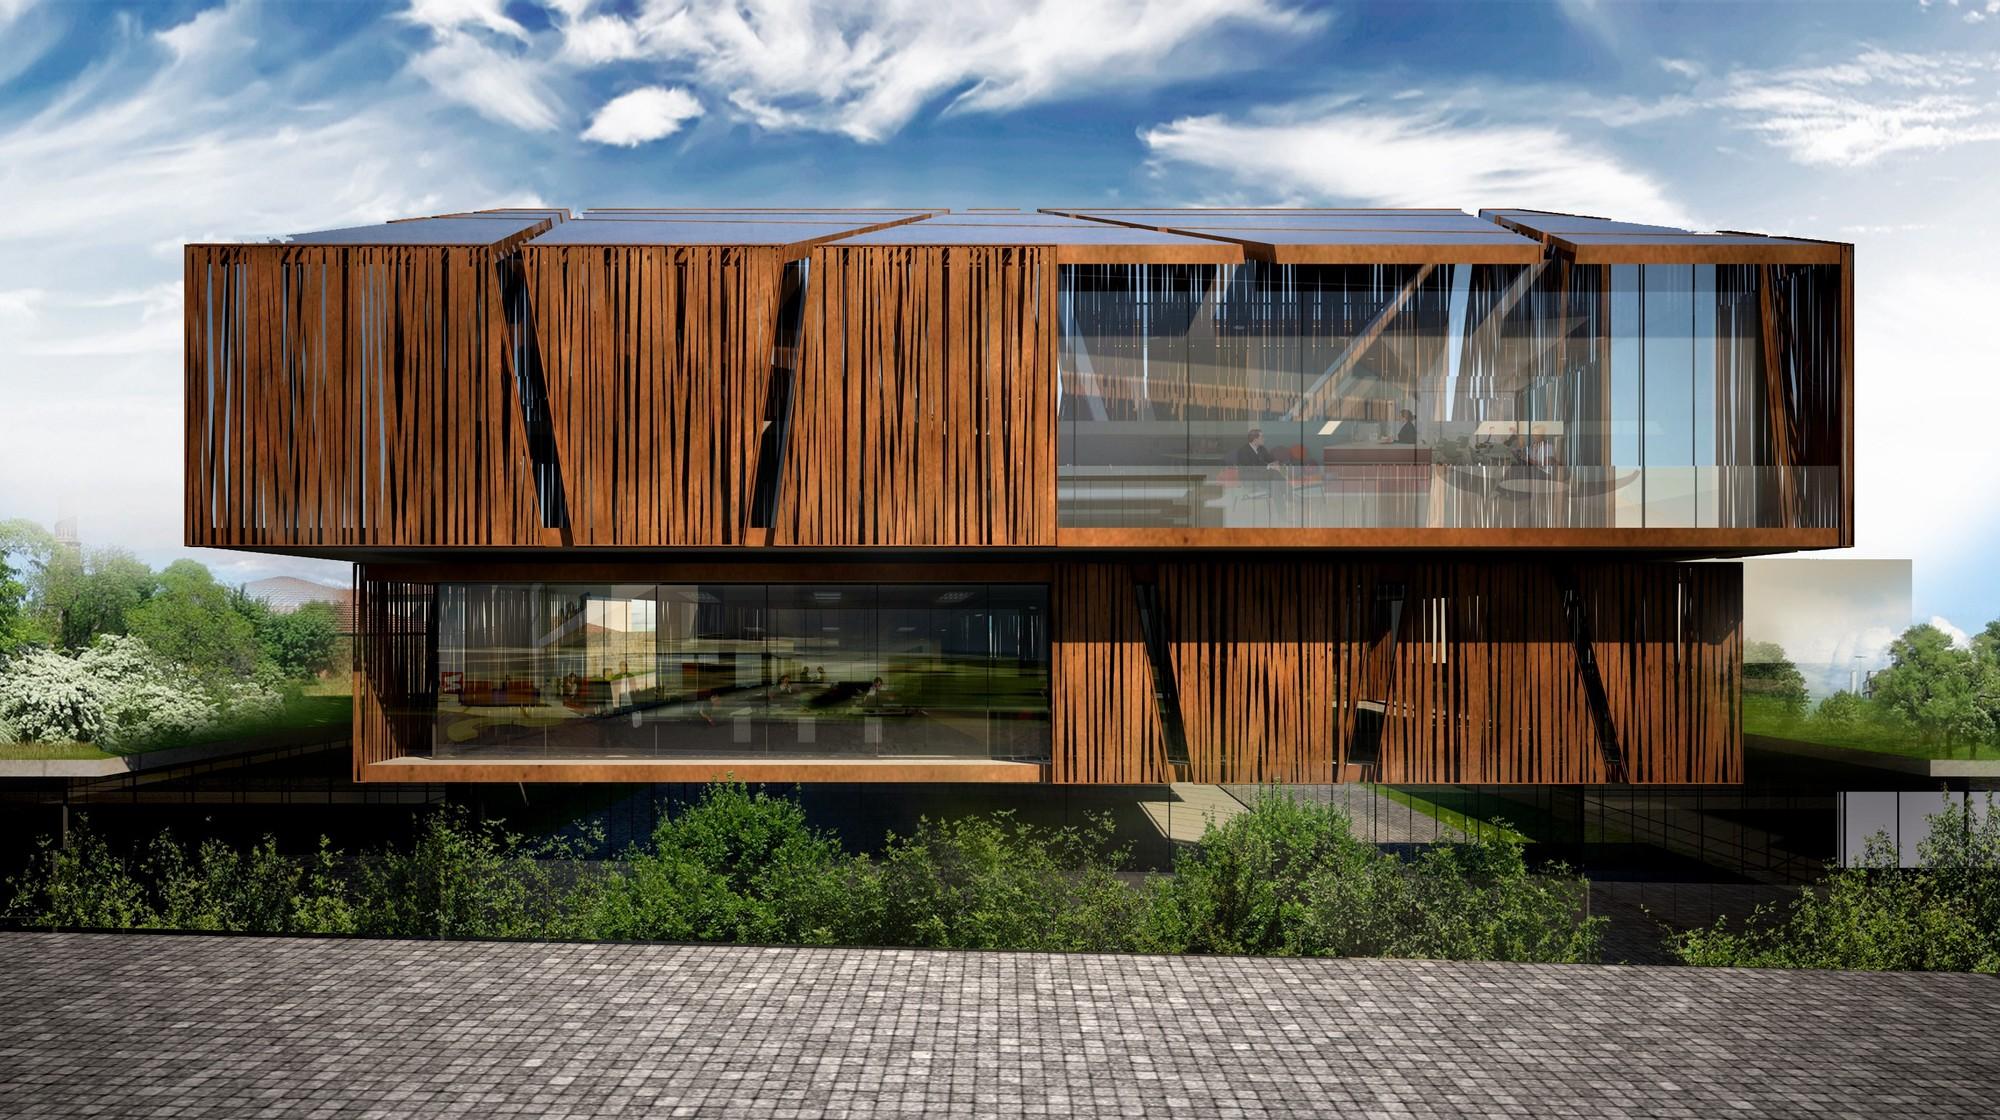 Future projects office winner: Selcuk Ecza Headquarters, Turkey by tabbanlioglu architects